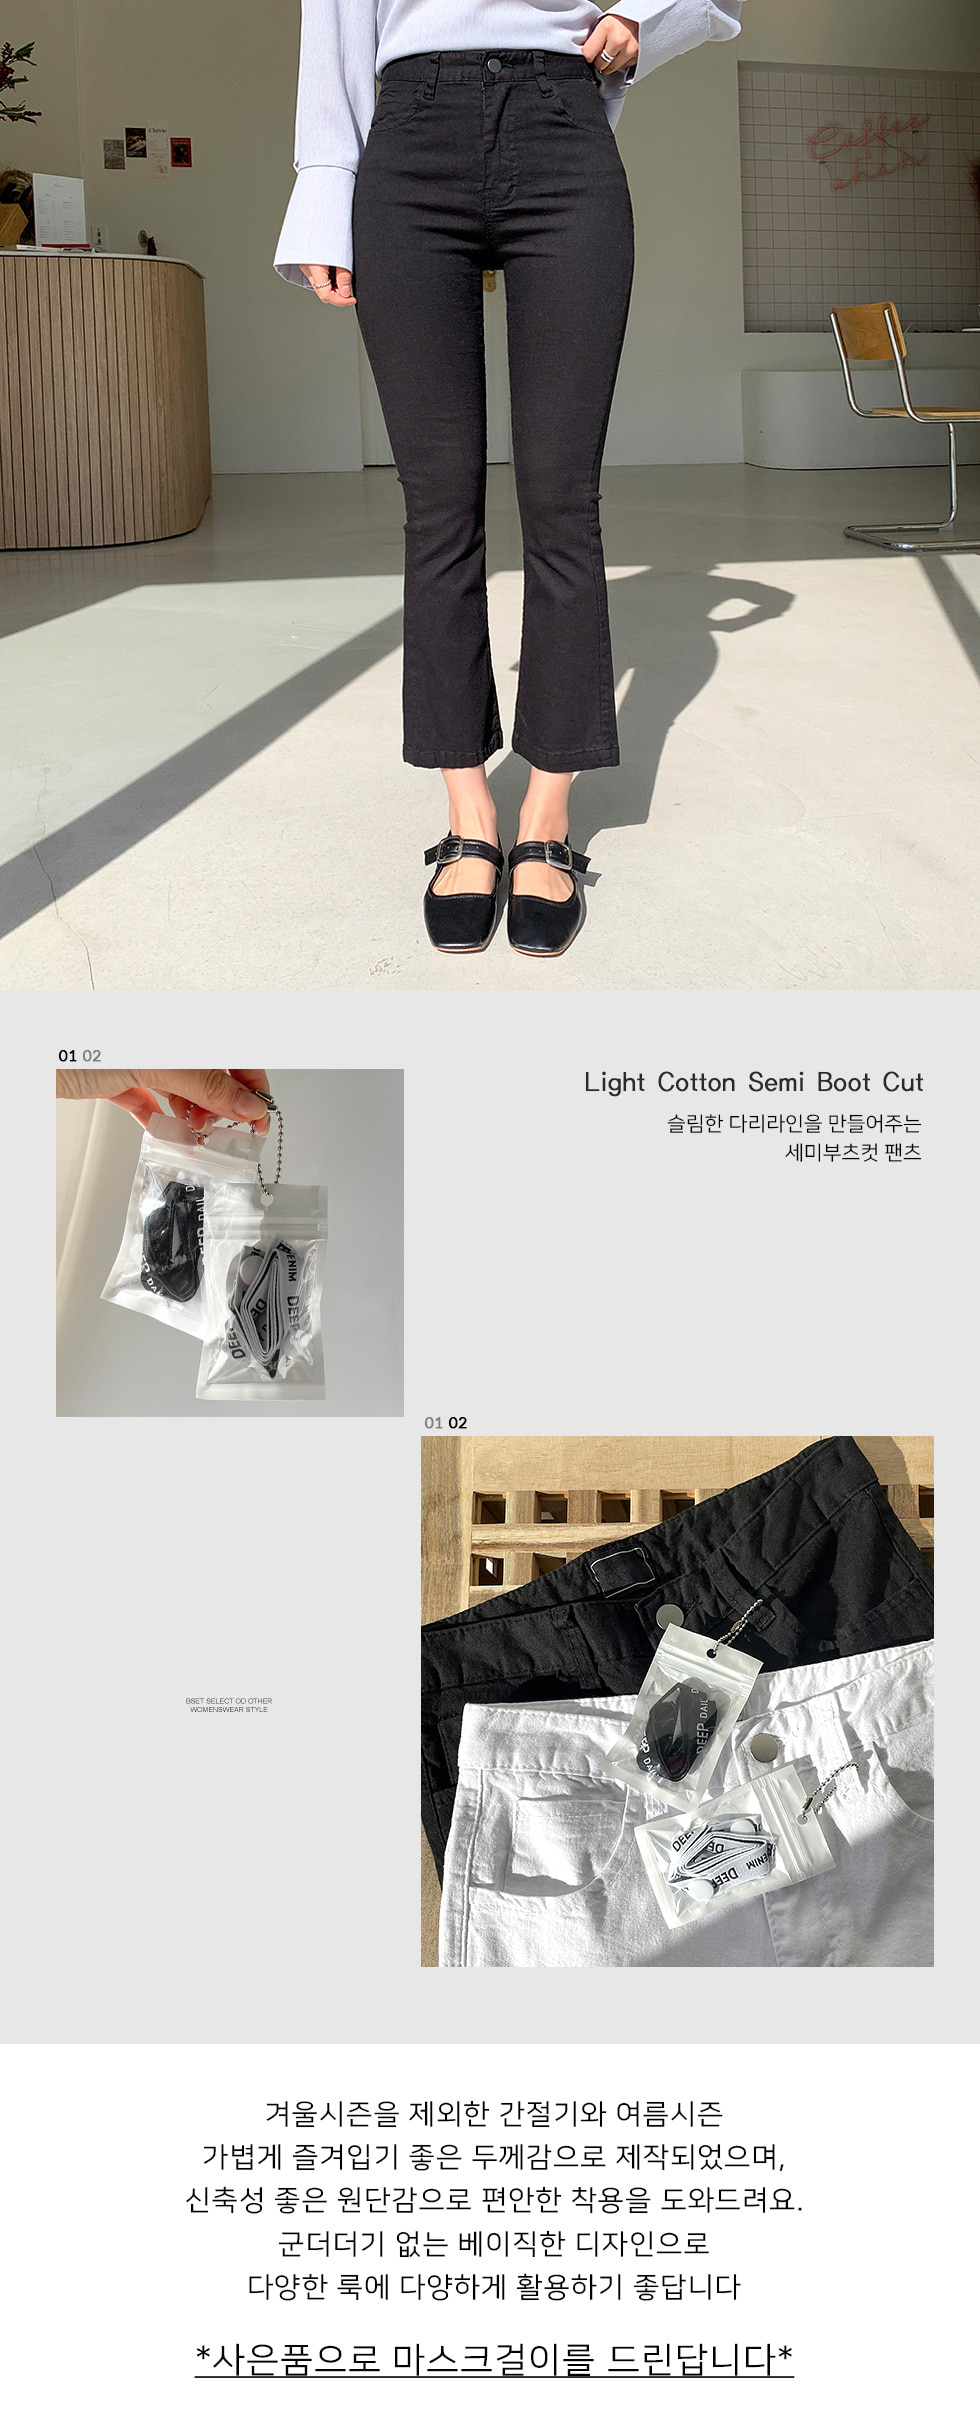 Light Cotton Semi Flared